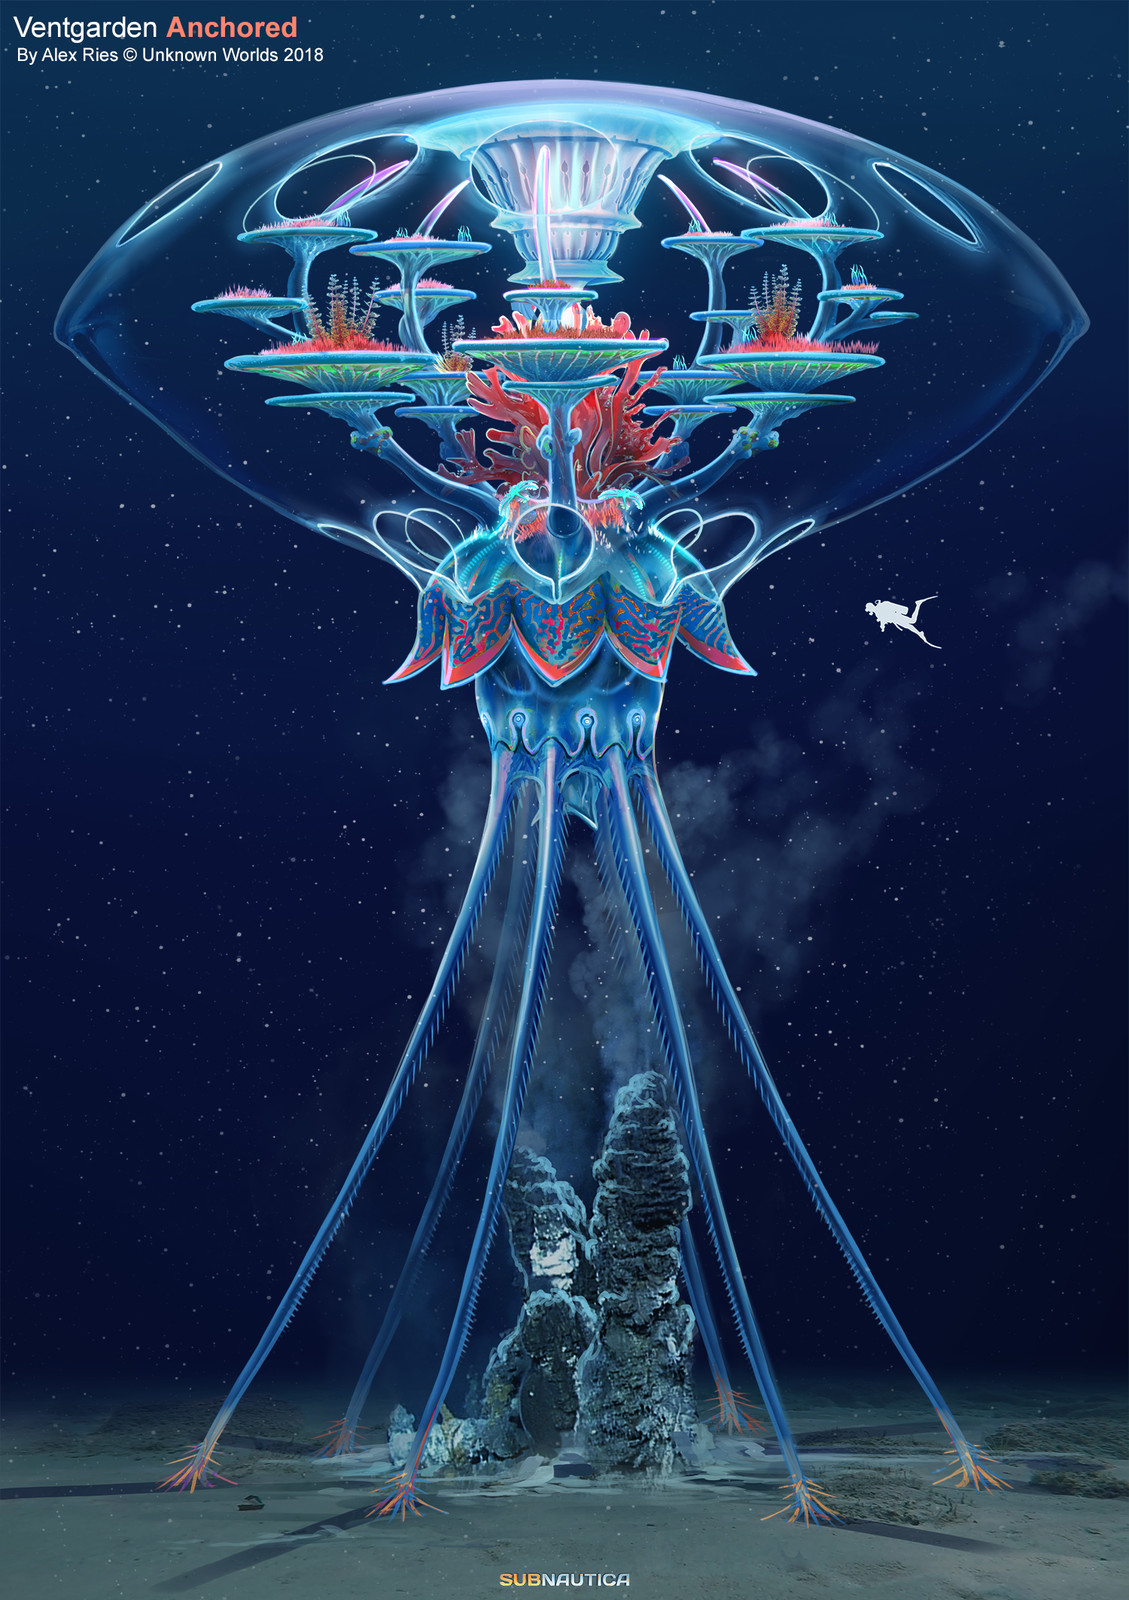 Anchored over an energy source: a deep sea vent